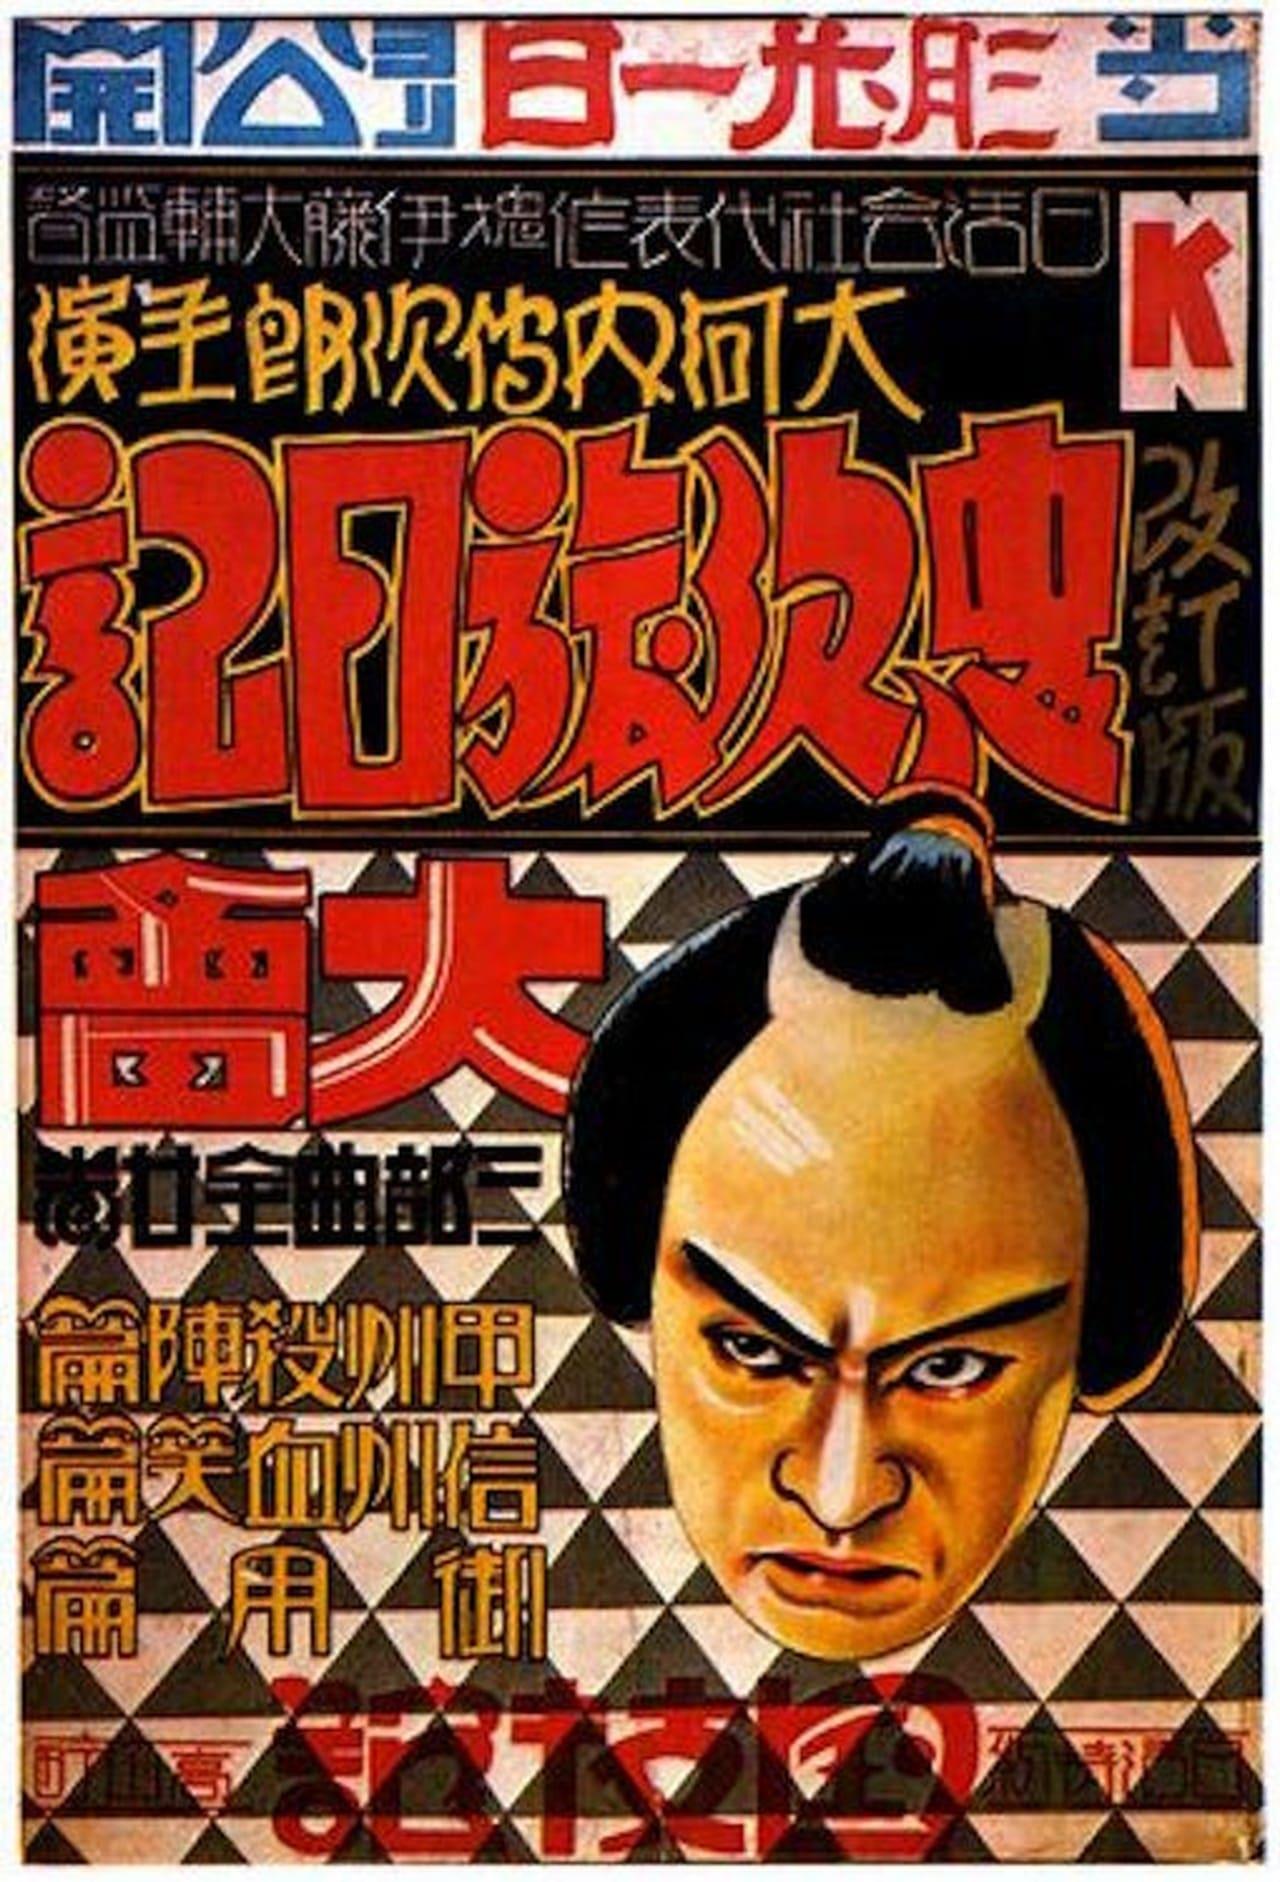 Chuji's Travel Diary III: The Chuji Patrol Episode (1927)